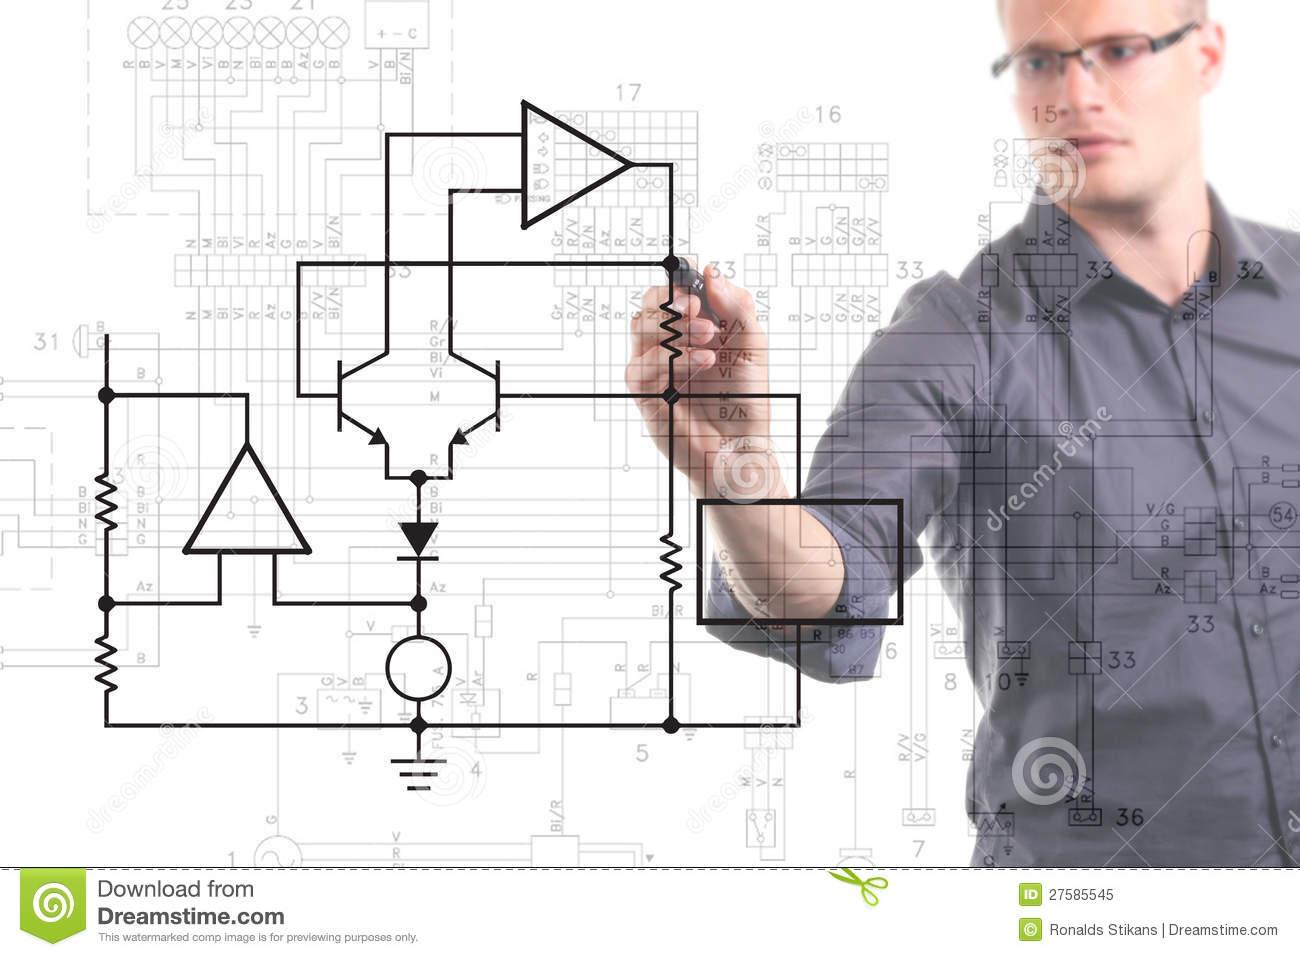 Miraculous Hand Drawing A Blockdiagram Royalty Free Stock Photos Image Wiring Cloud Cranvenetmohammedshrineorg